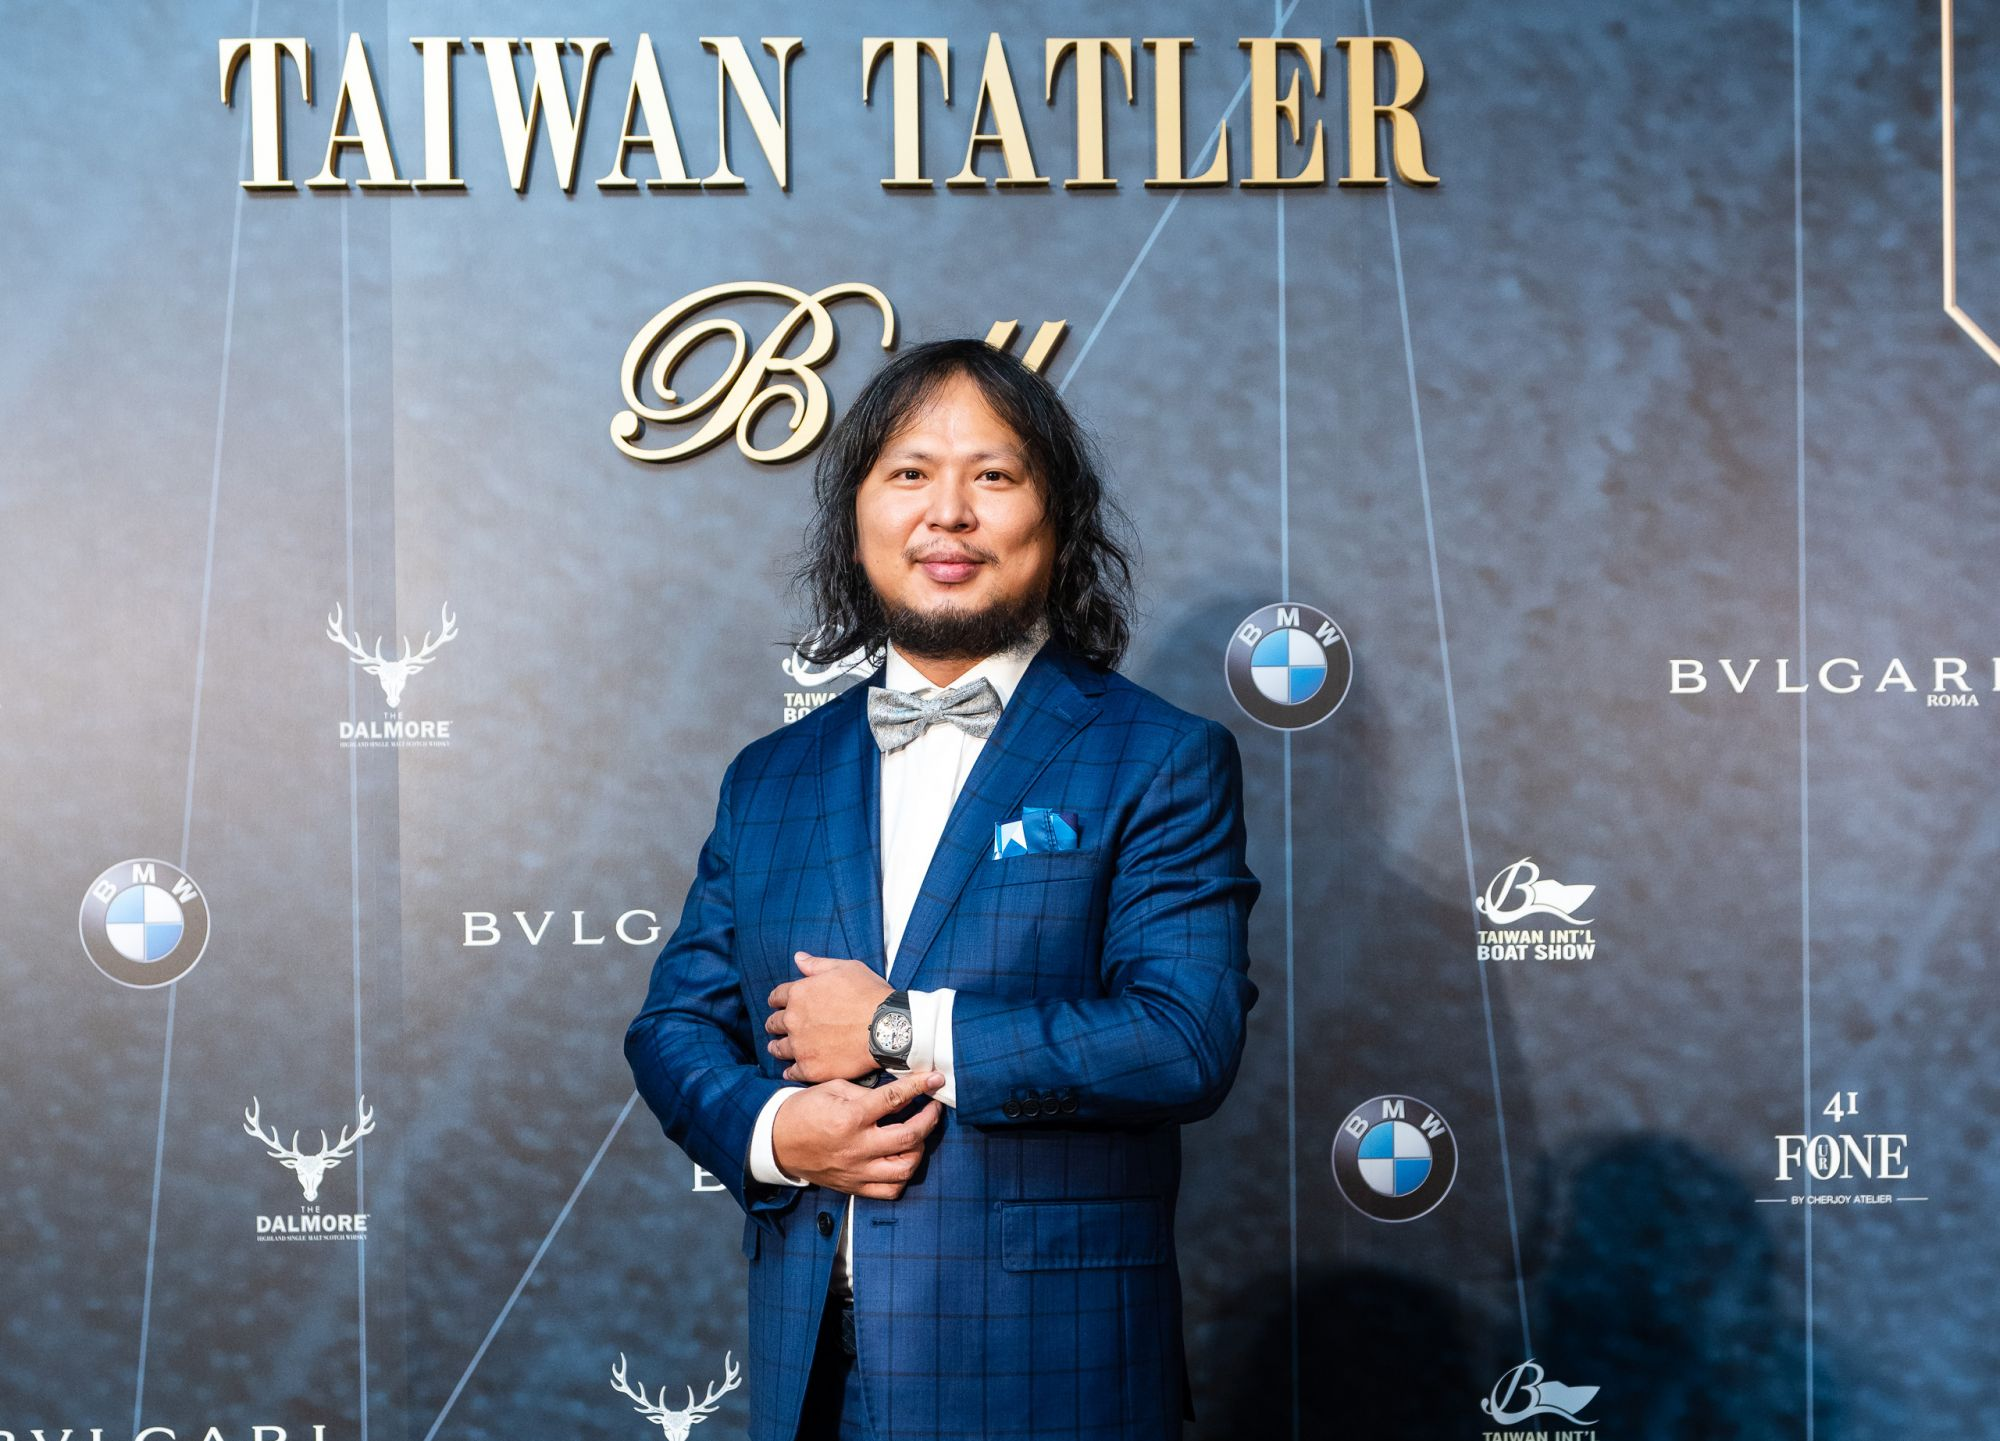 2019 Taiwan Tatler Ball榮耀時刻!Bvlgari相伴新光三越郭思婷、奧丁丁王俊凱等各界名流閃耀登場